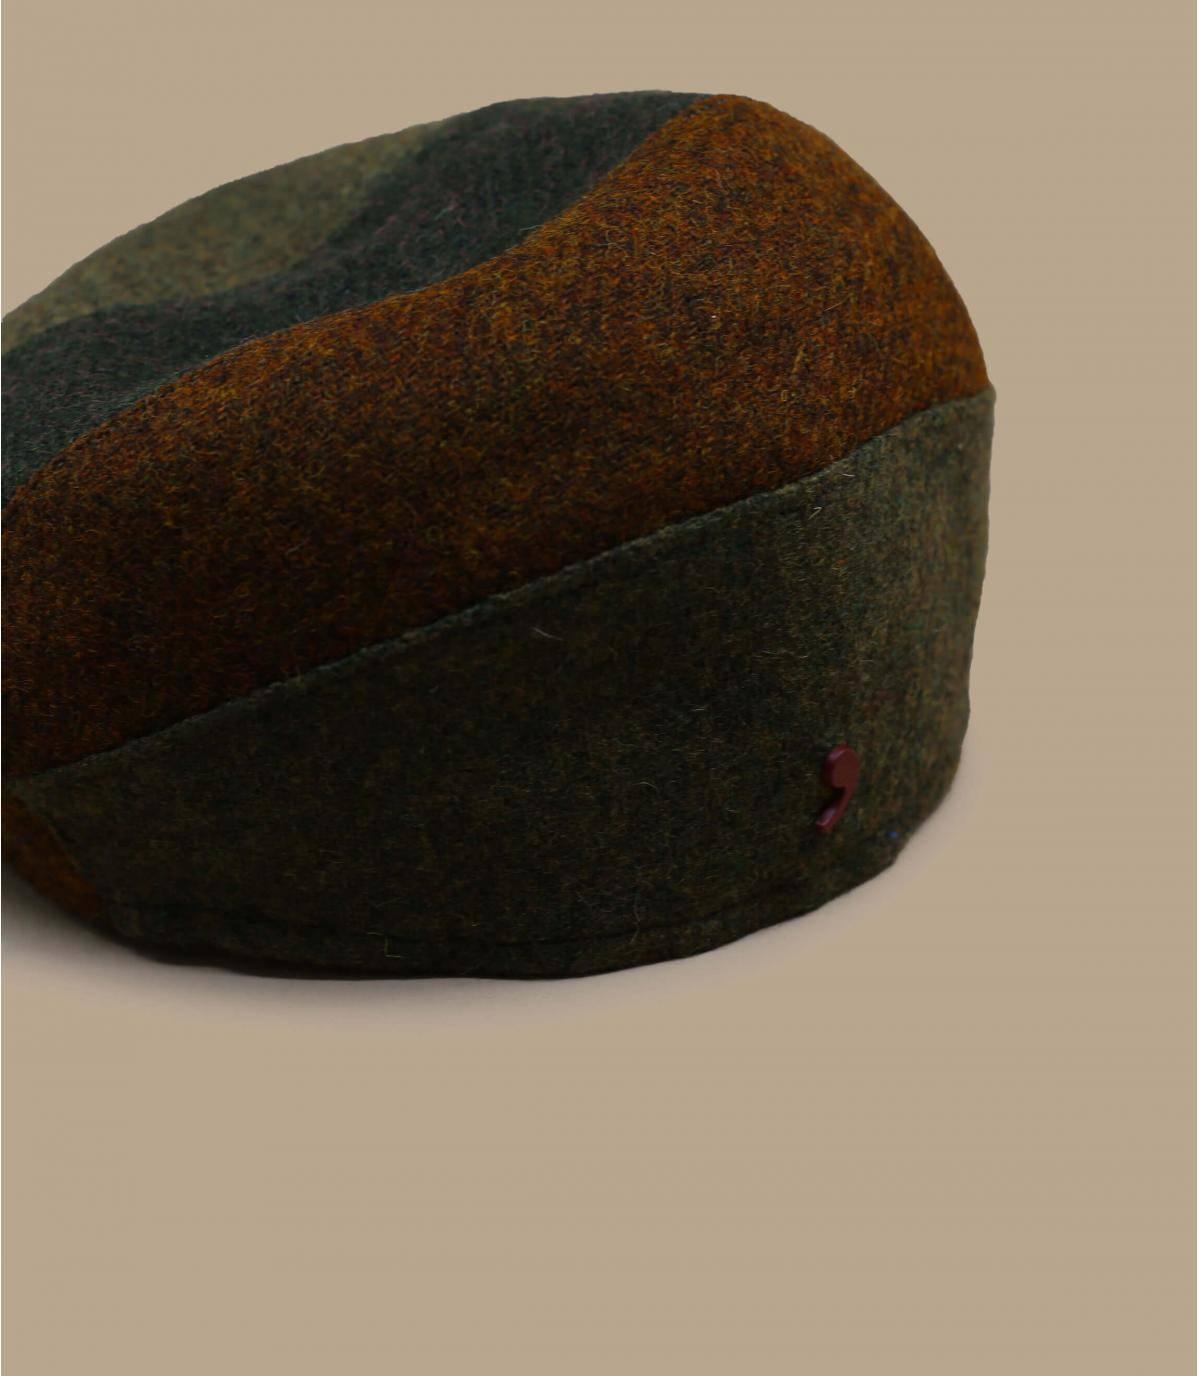 Dettagli Prince Wool Multi - image 3